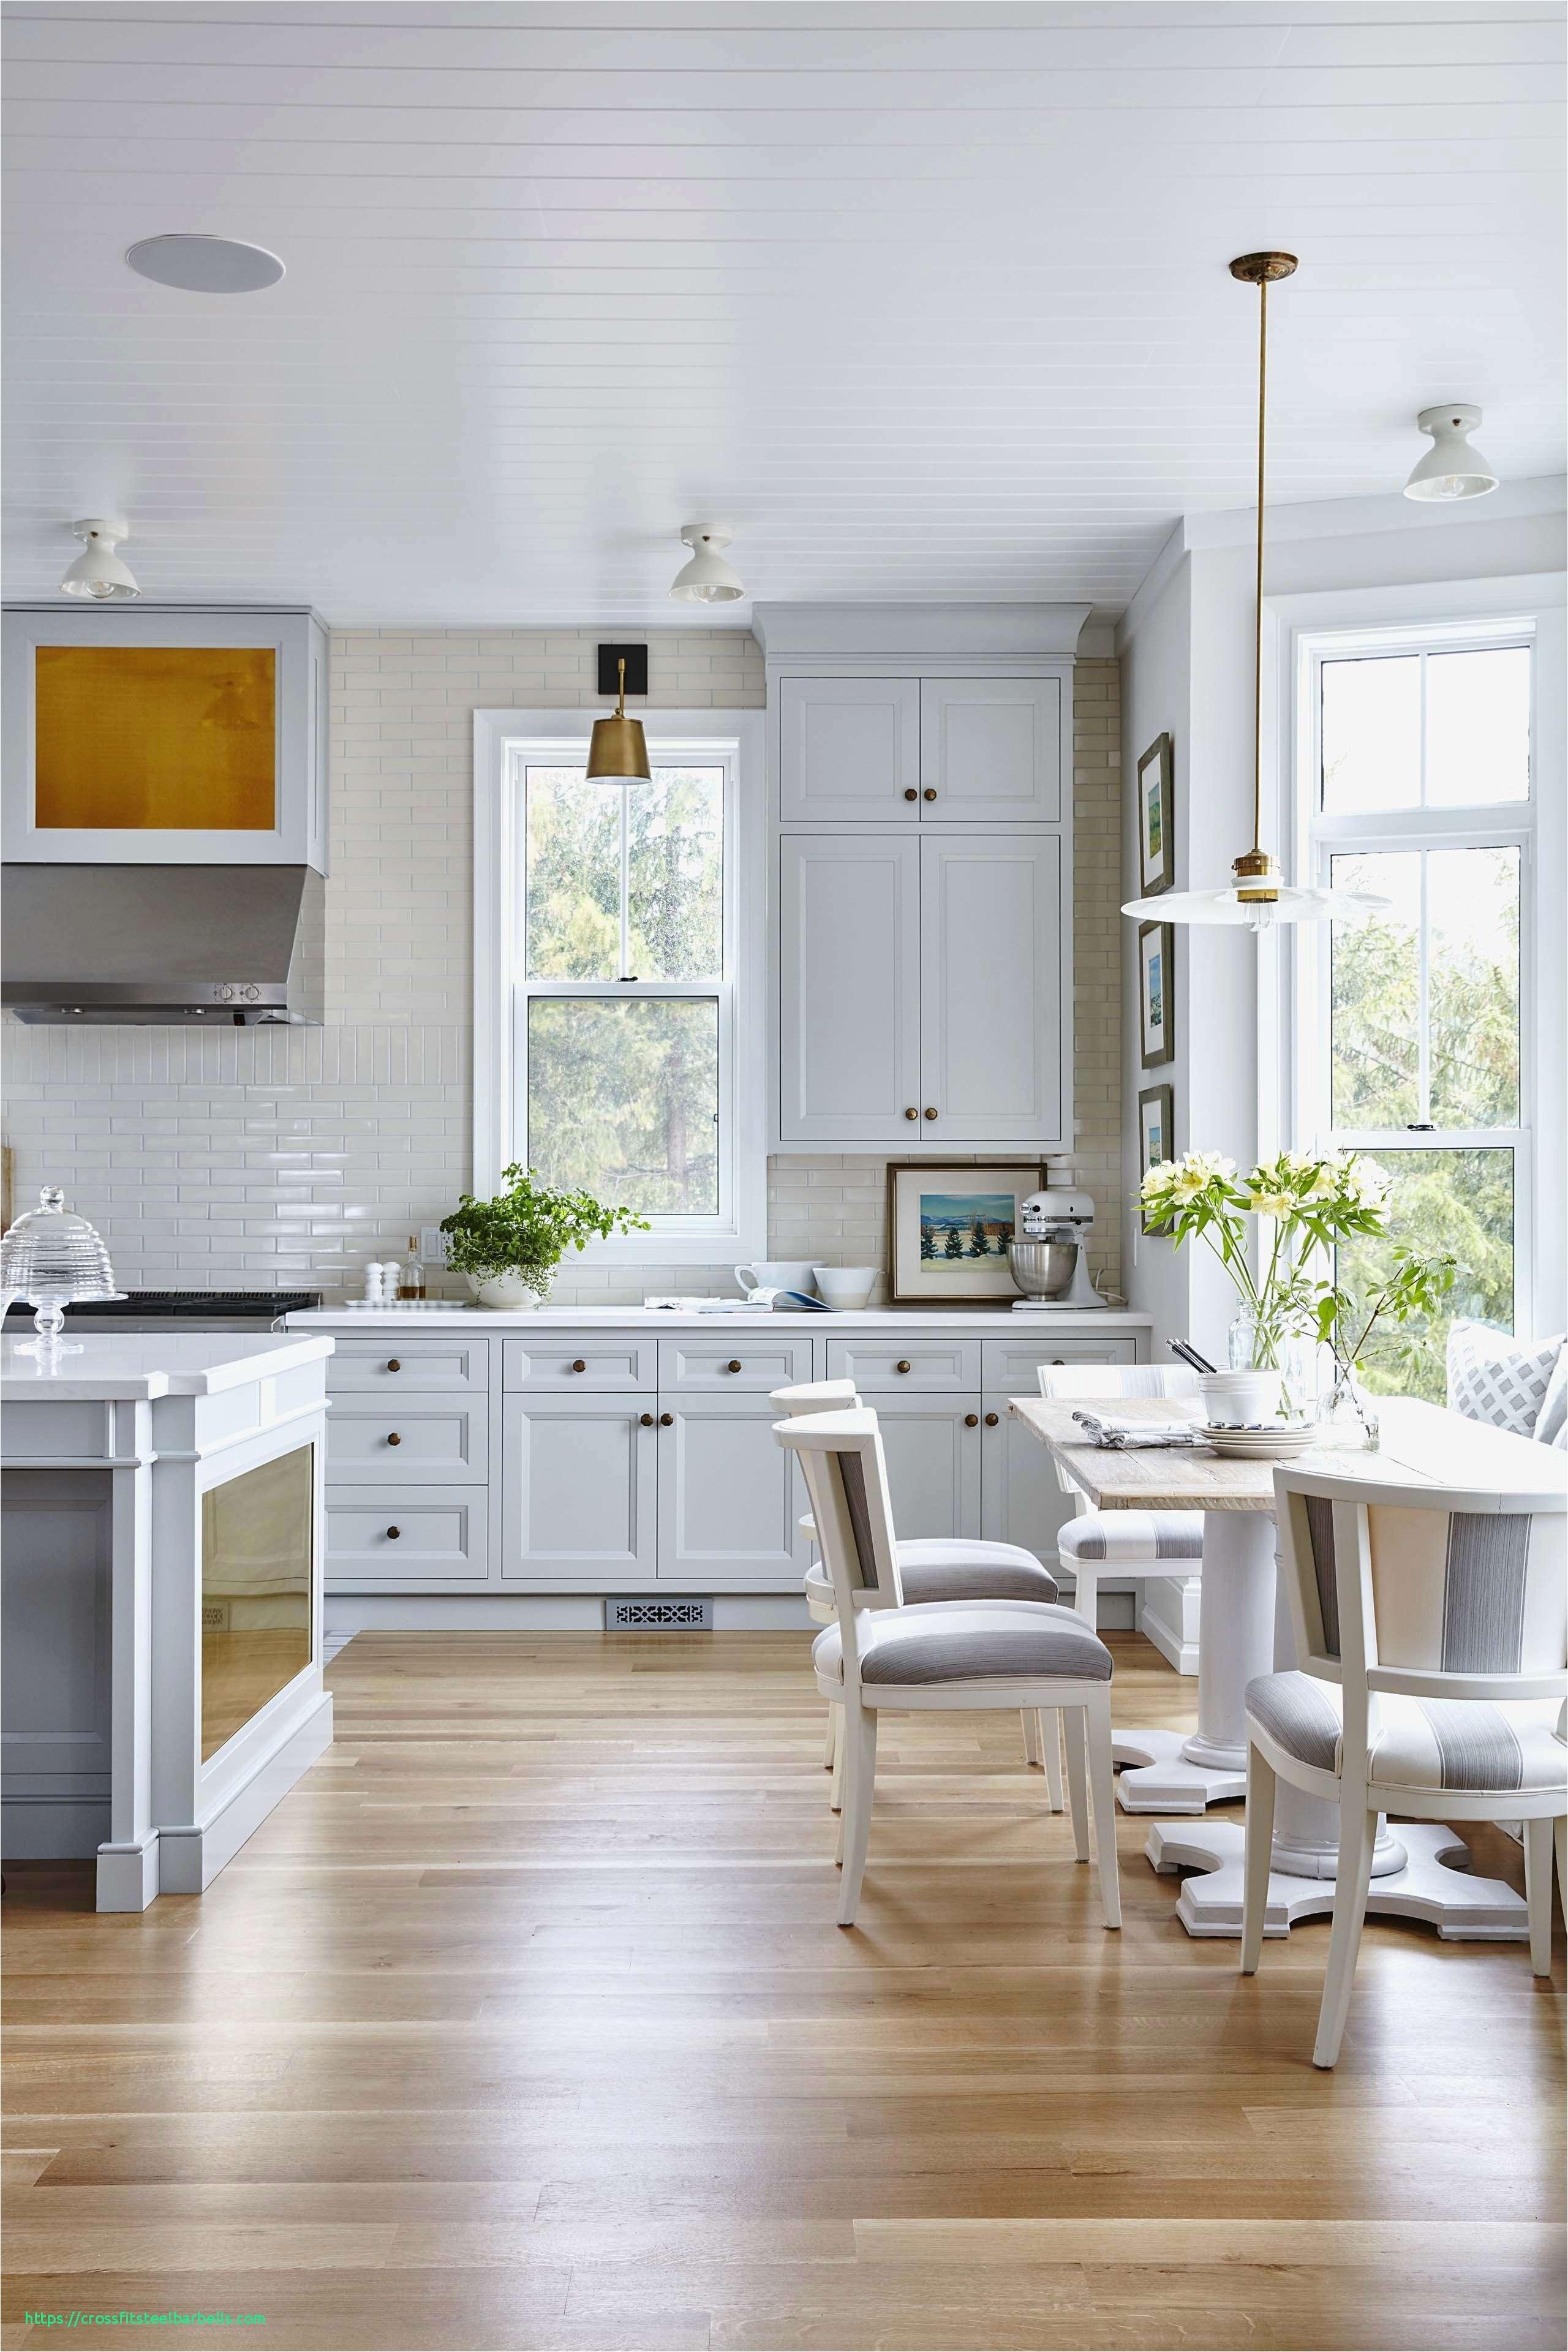 Free Fit Flooring Interior Design Styles for Small Kitchen Unique Kitchen Joys Kitchen